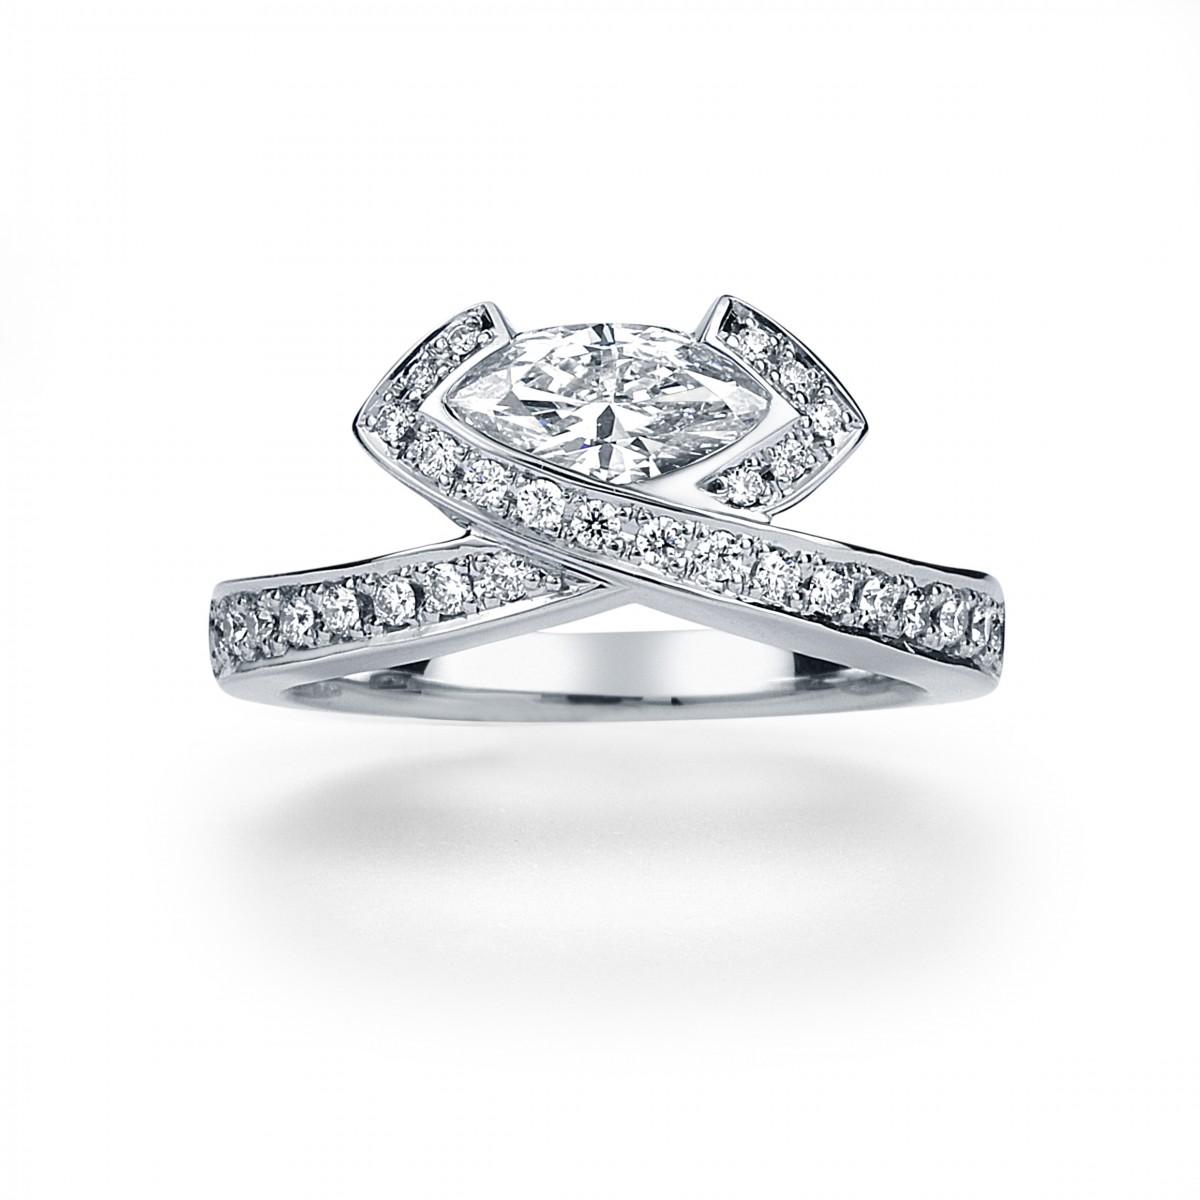 K18WG Marquise Shape Diamond Ring By Mark Hiroshi Willis